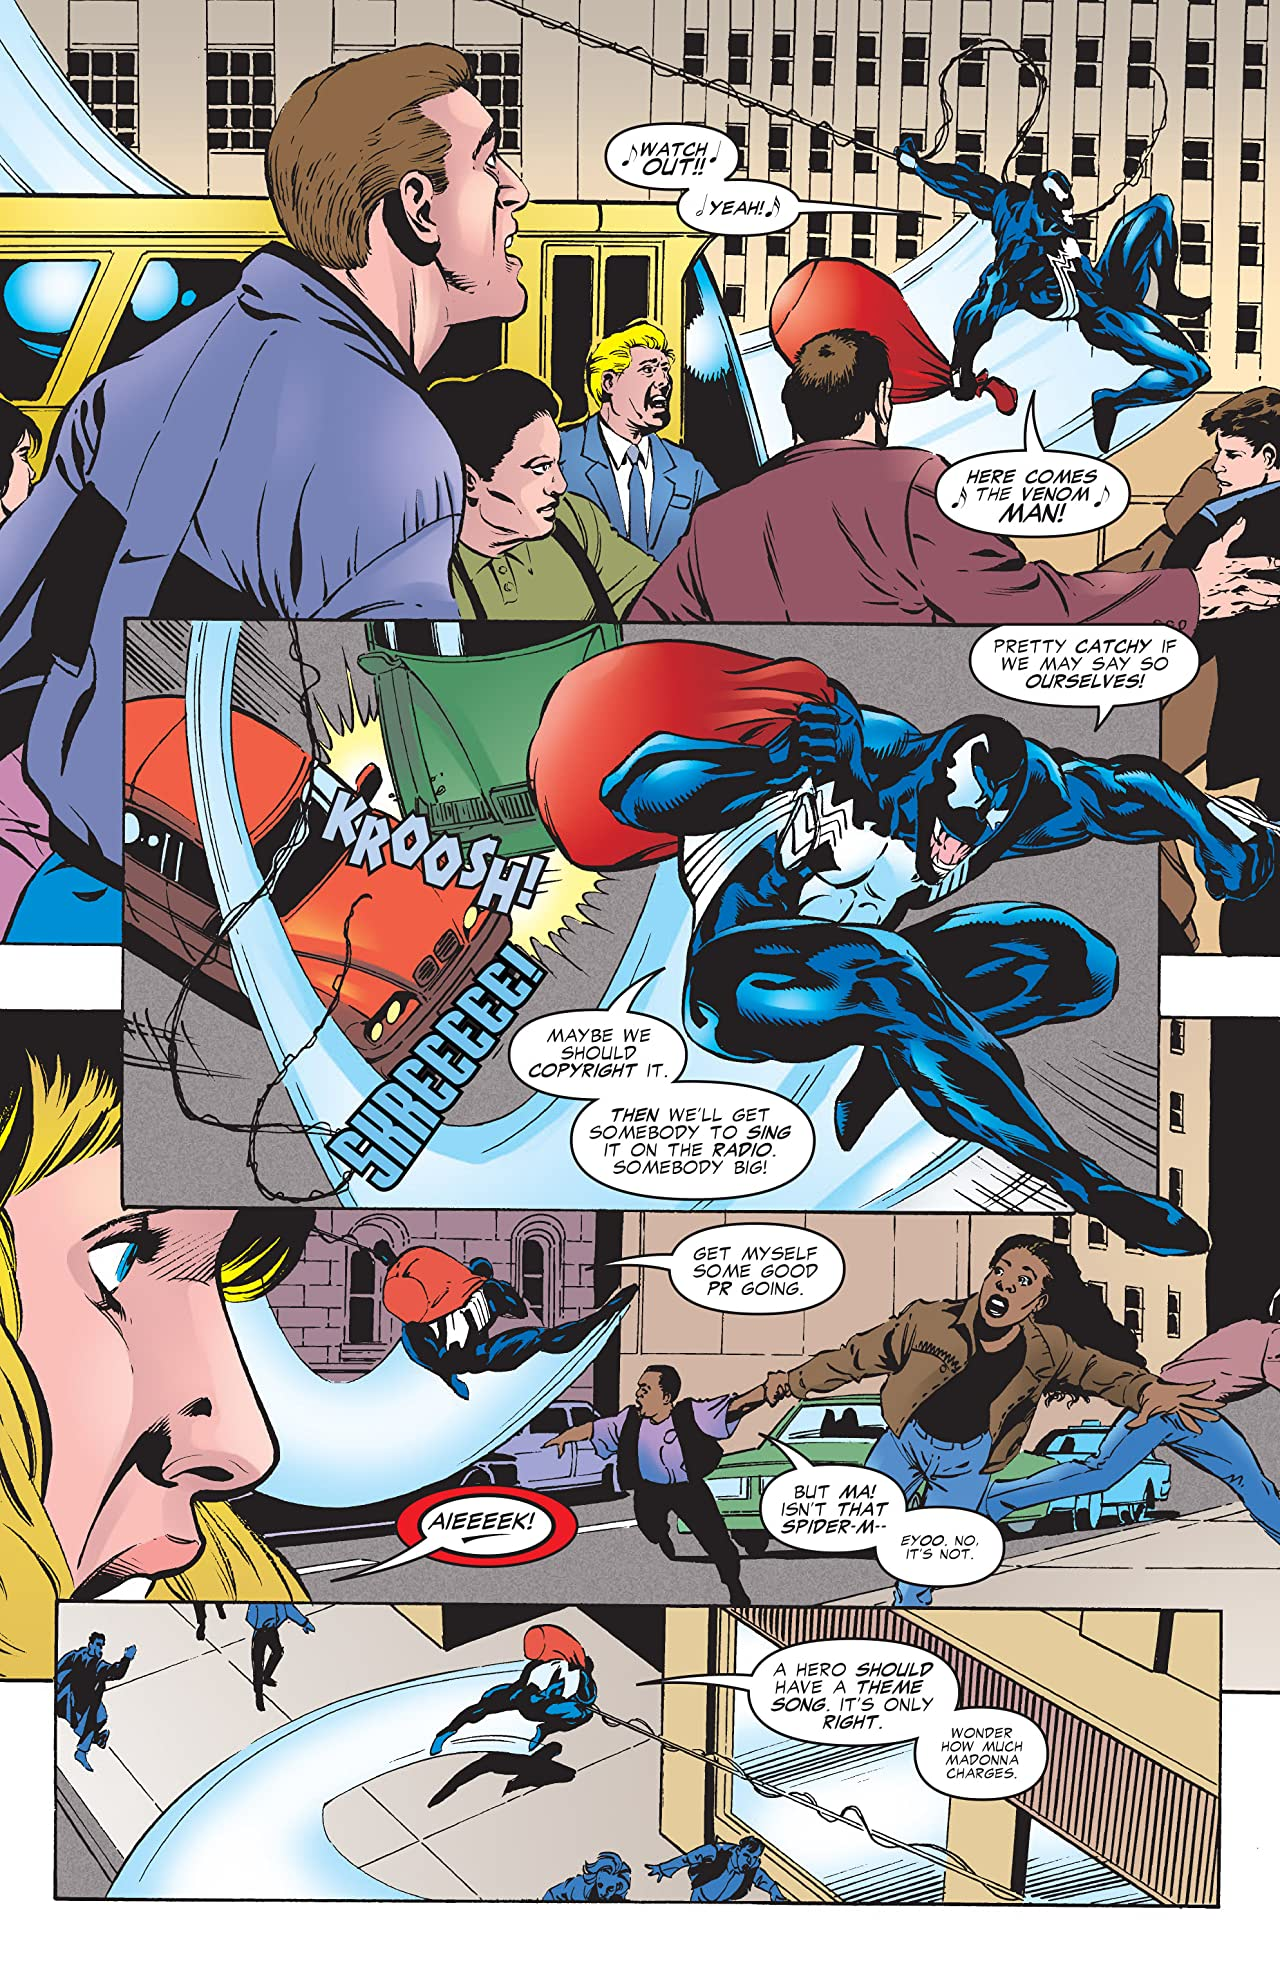 Venom: Sign of the Boss (1997) #1